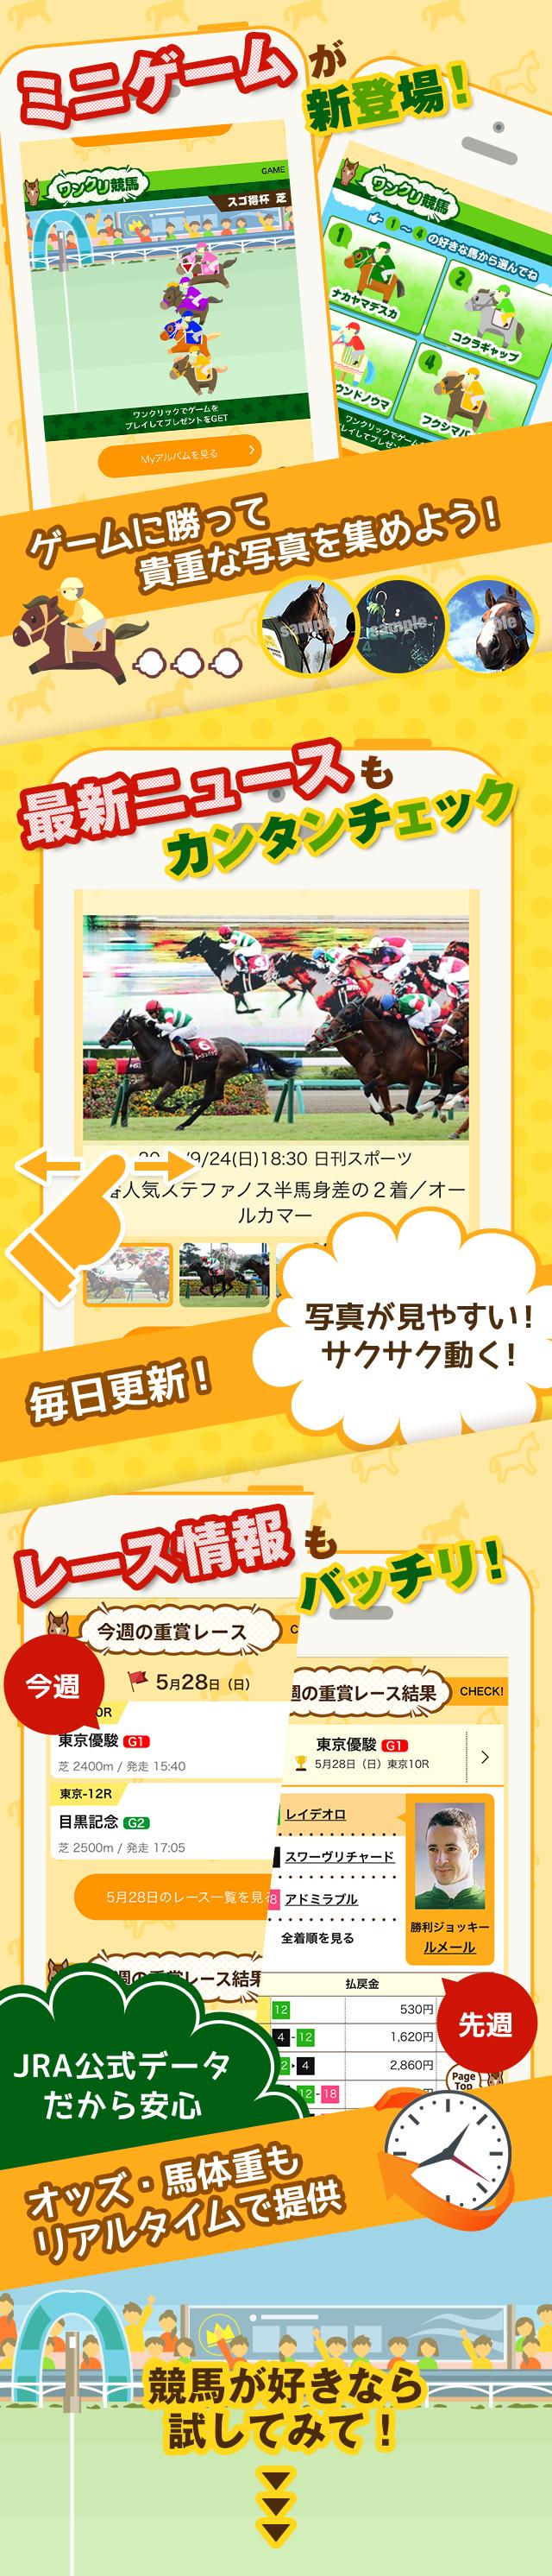 JRA-VAN 競馬情報 イメージ画像